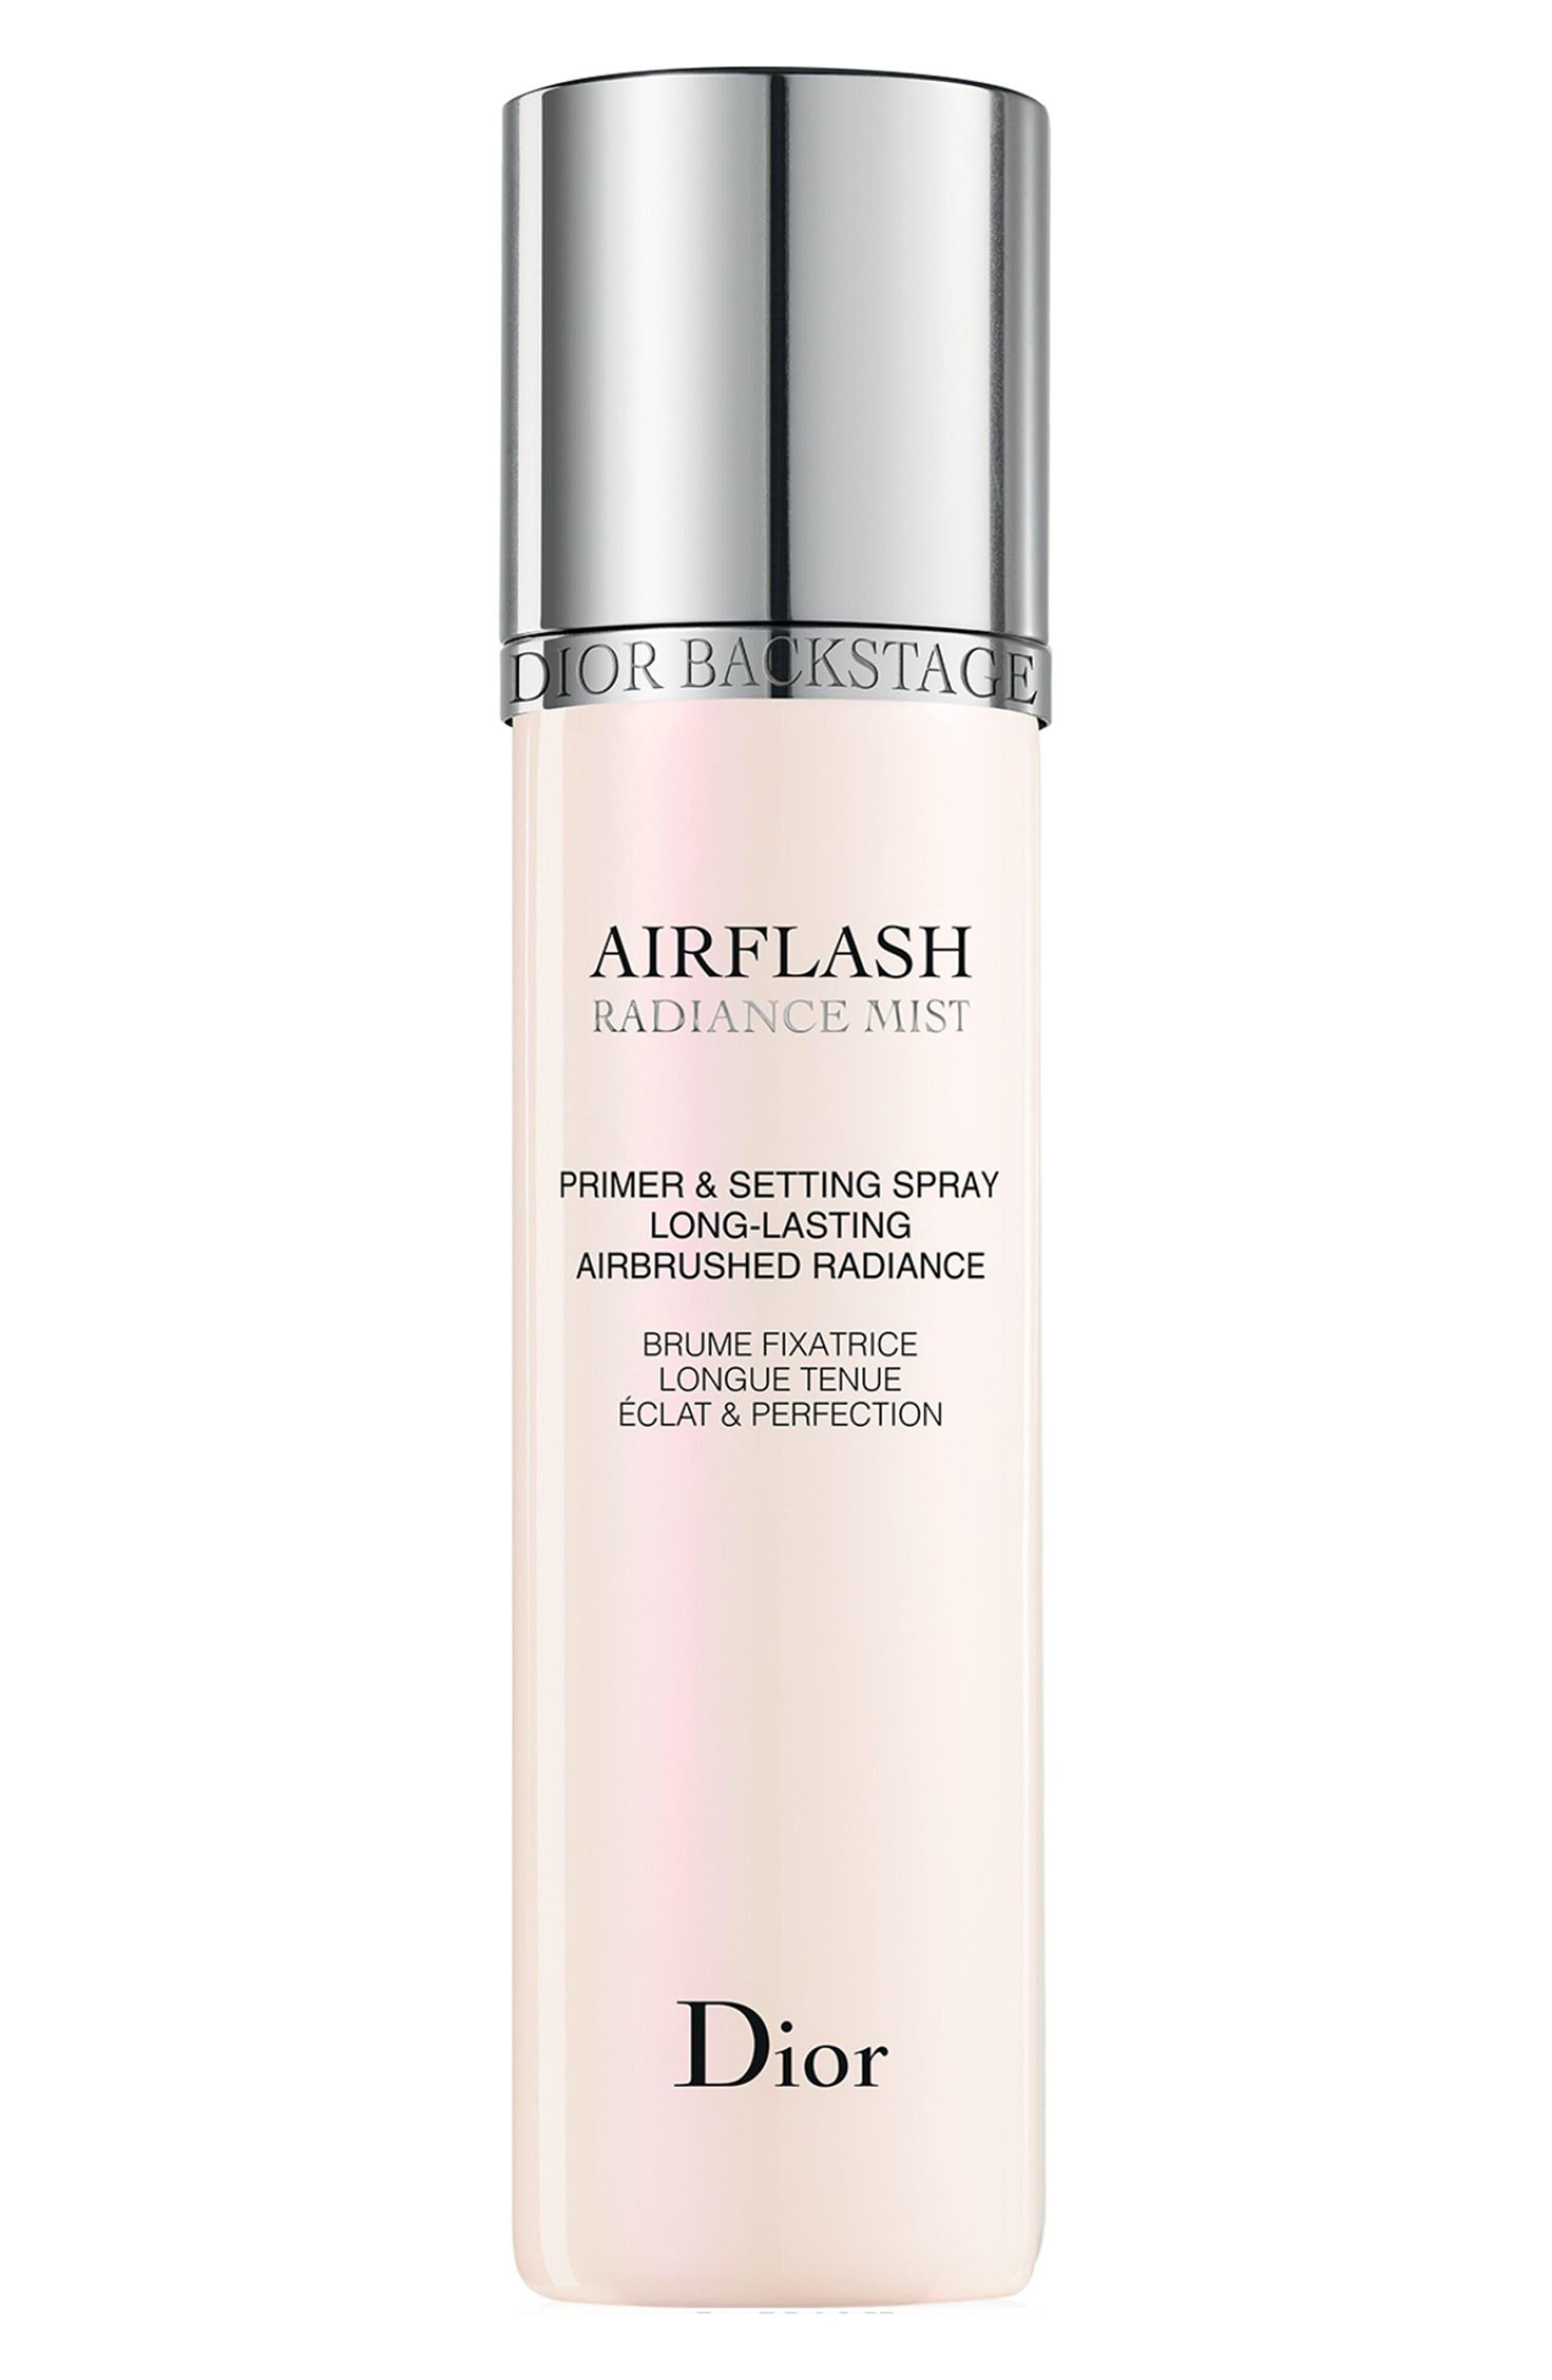 Backstage Airflash Radiance Mist Primer & Setting Spray, Main, color, 001 RADIANCE